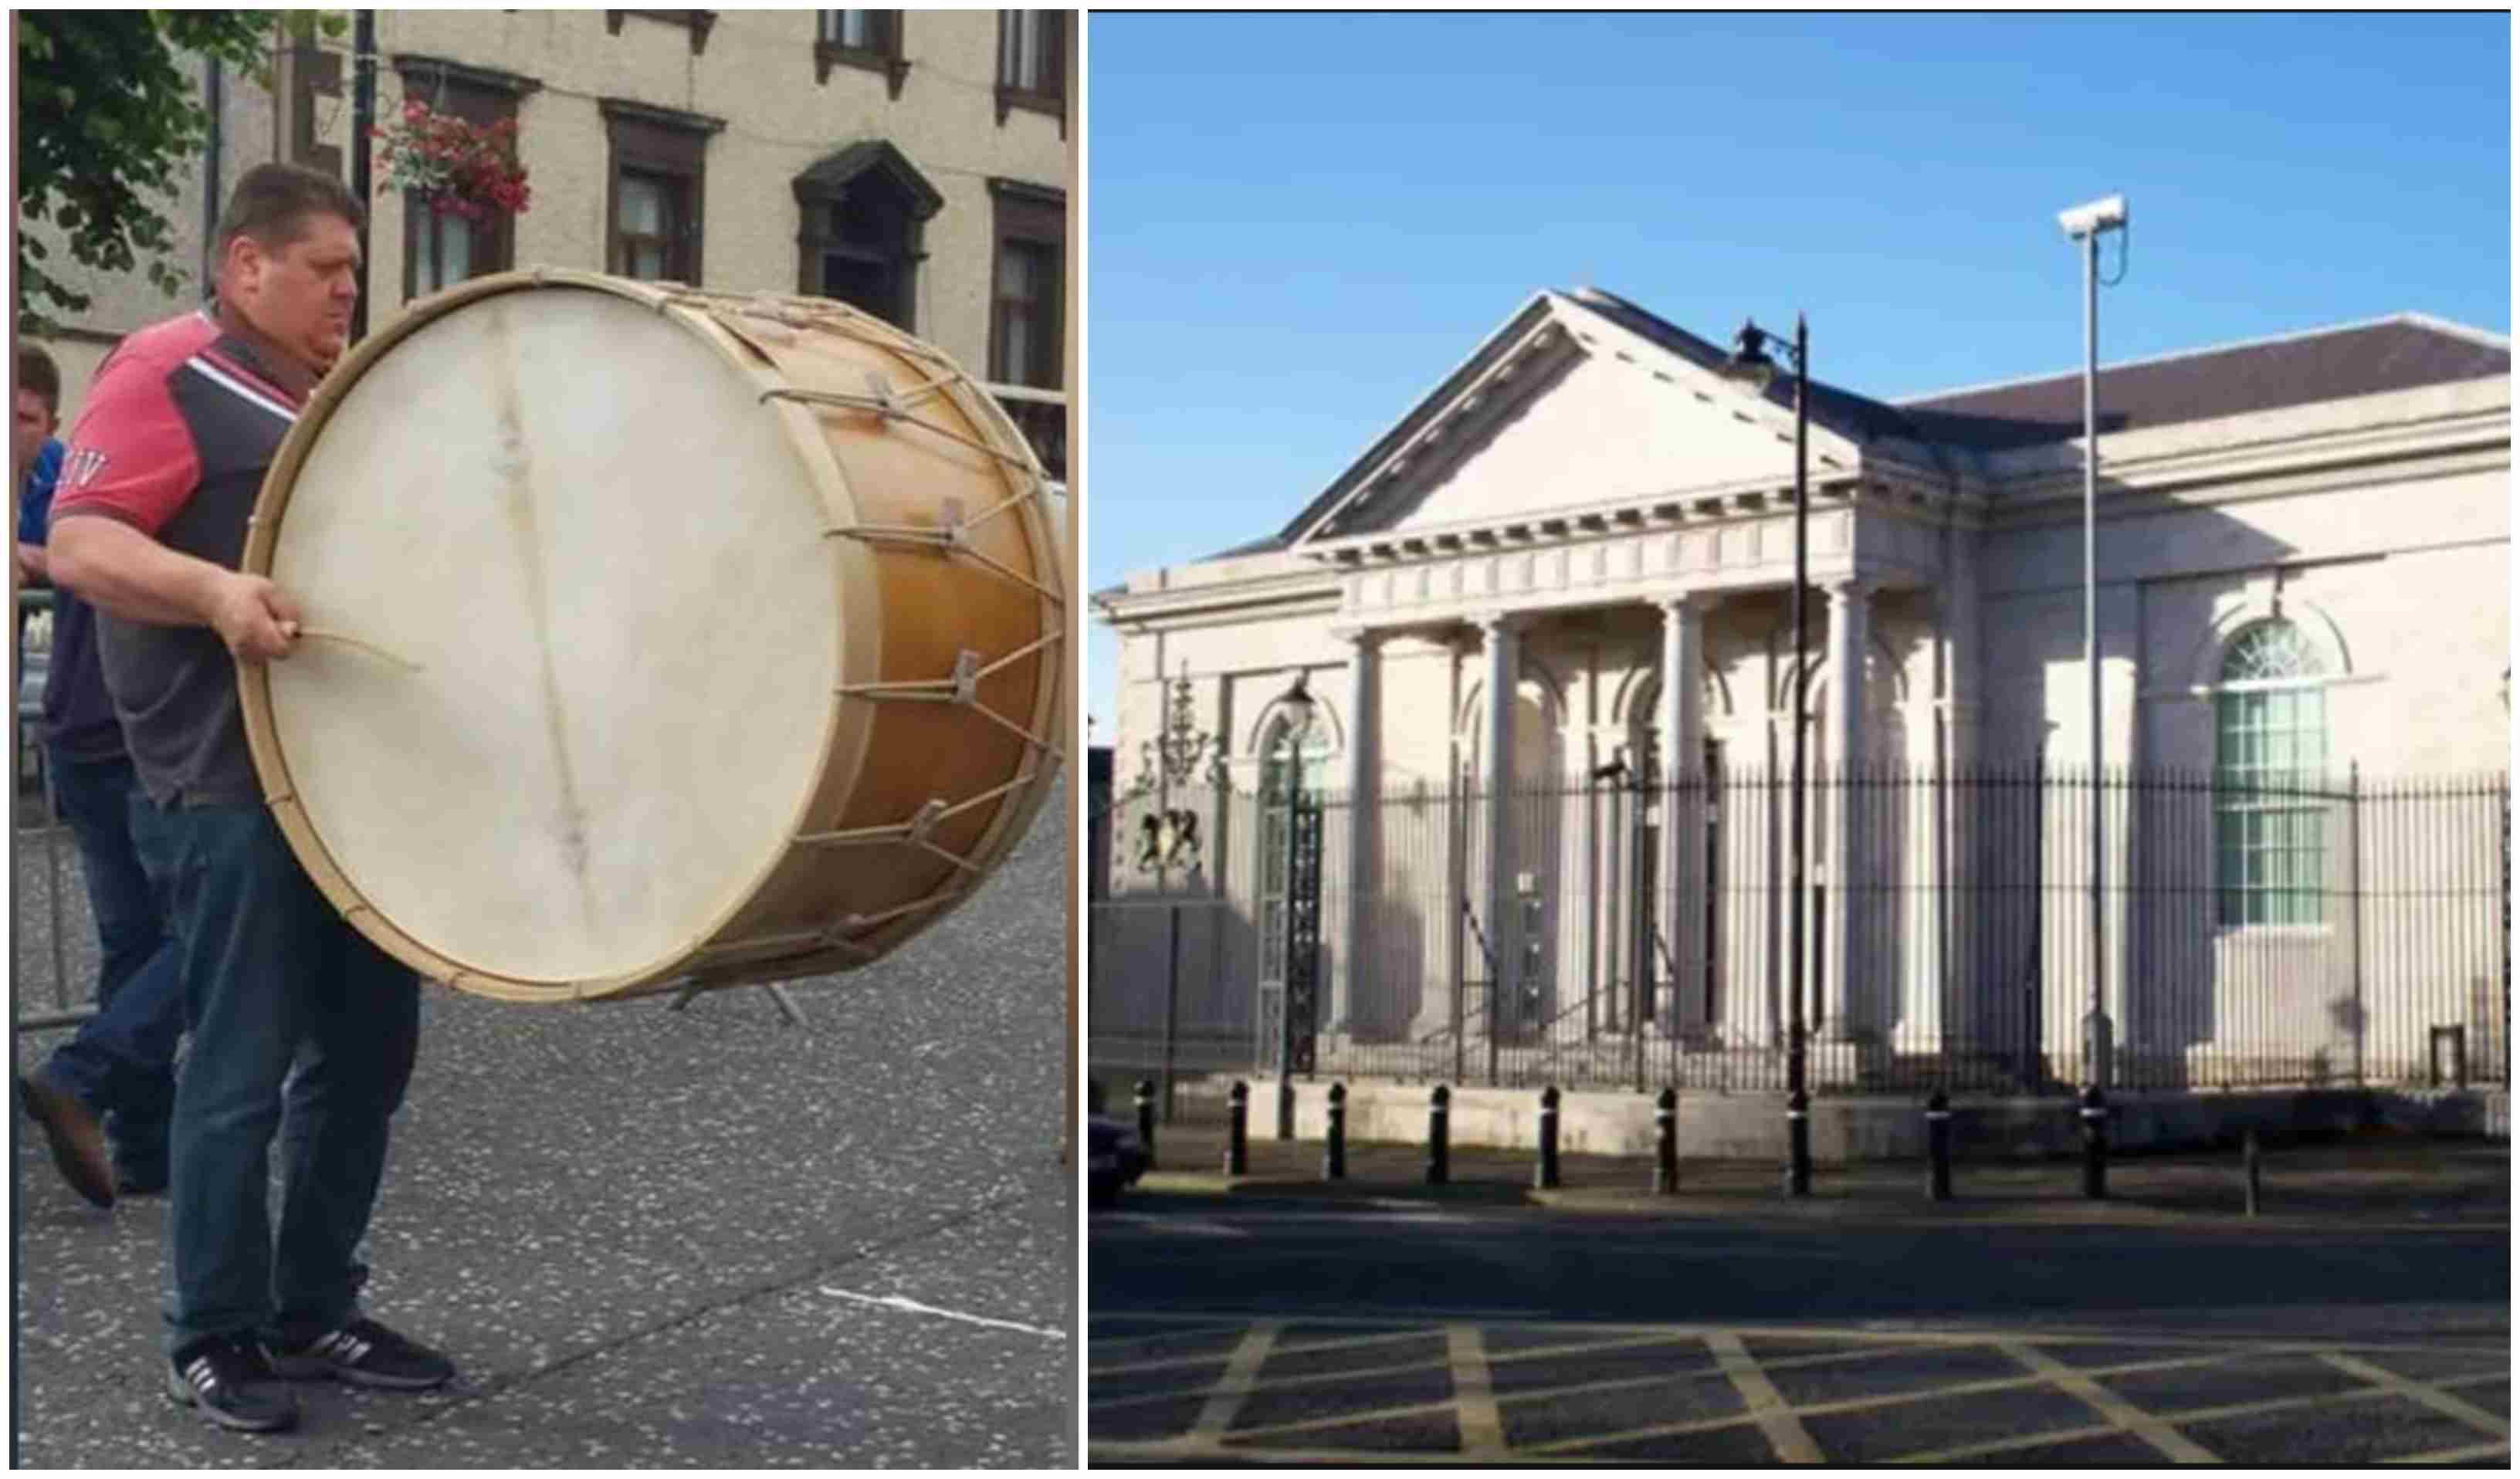 Richard Sterritt Armagh Courthouse